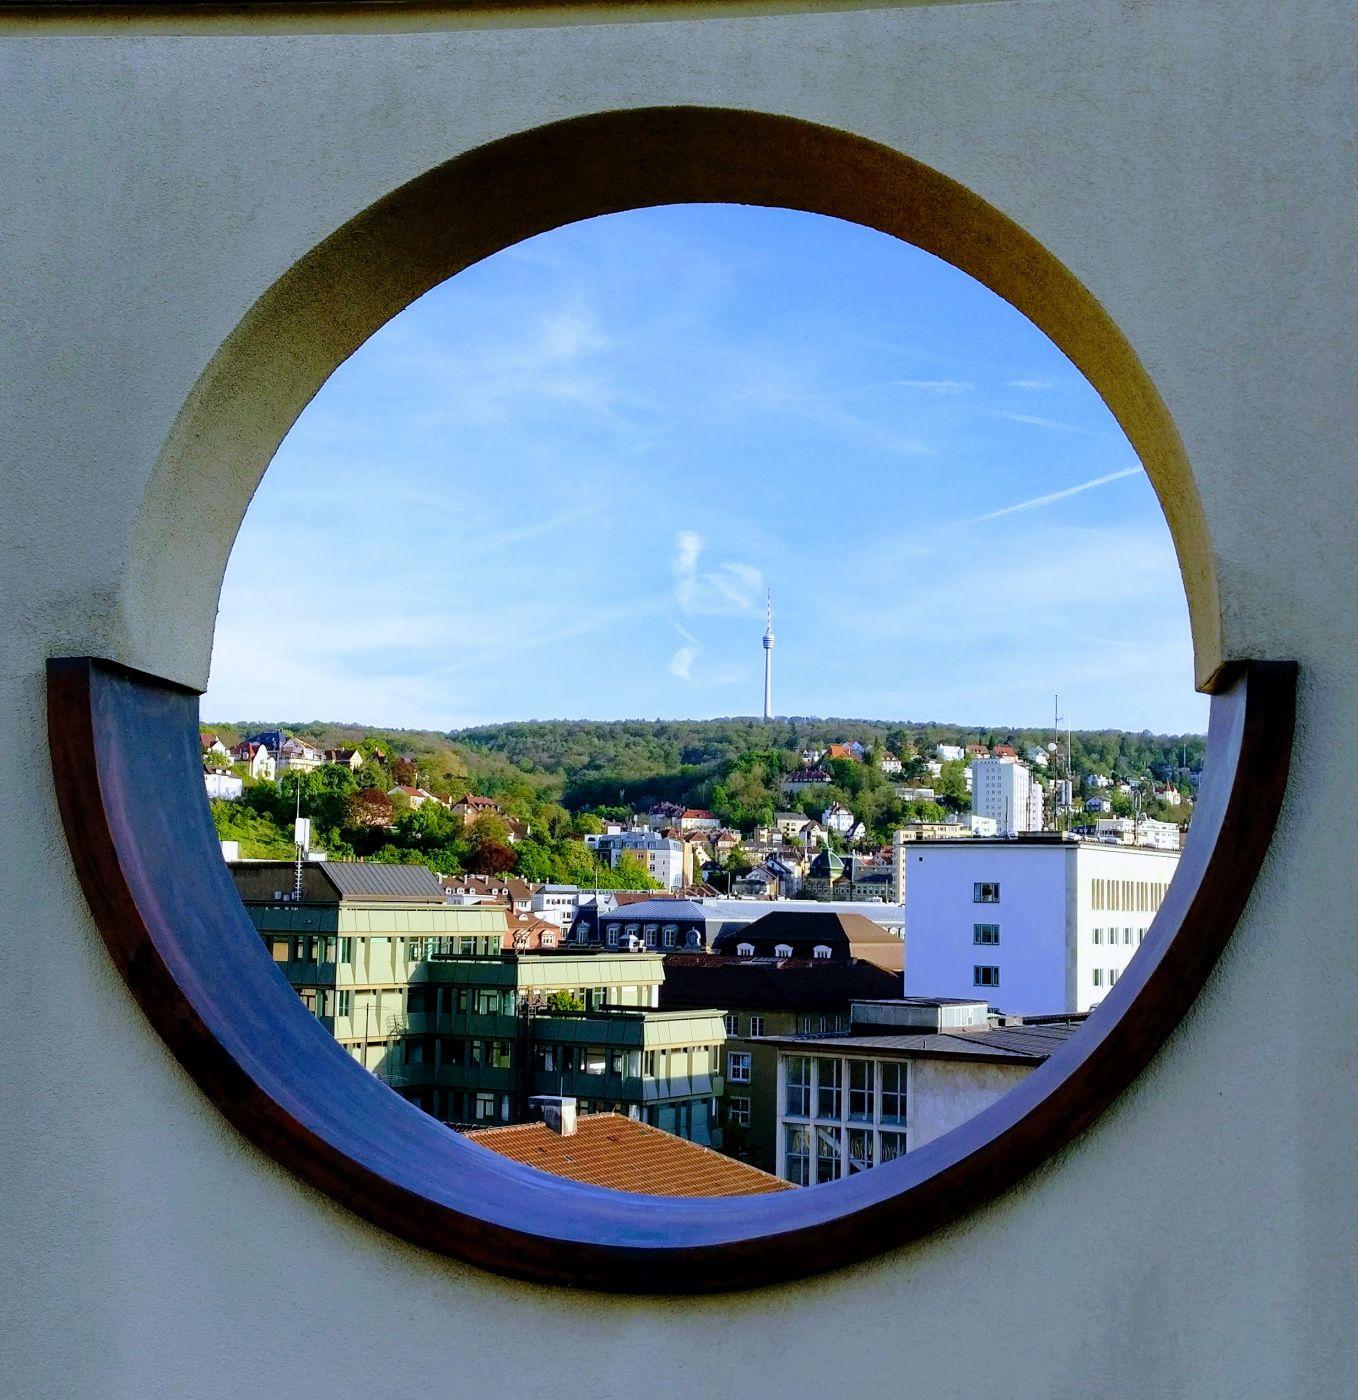 Roof Terrace @HMDK, Germany